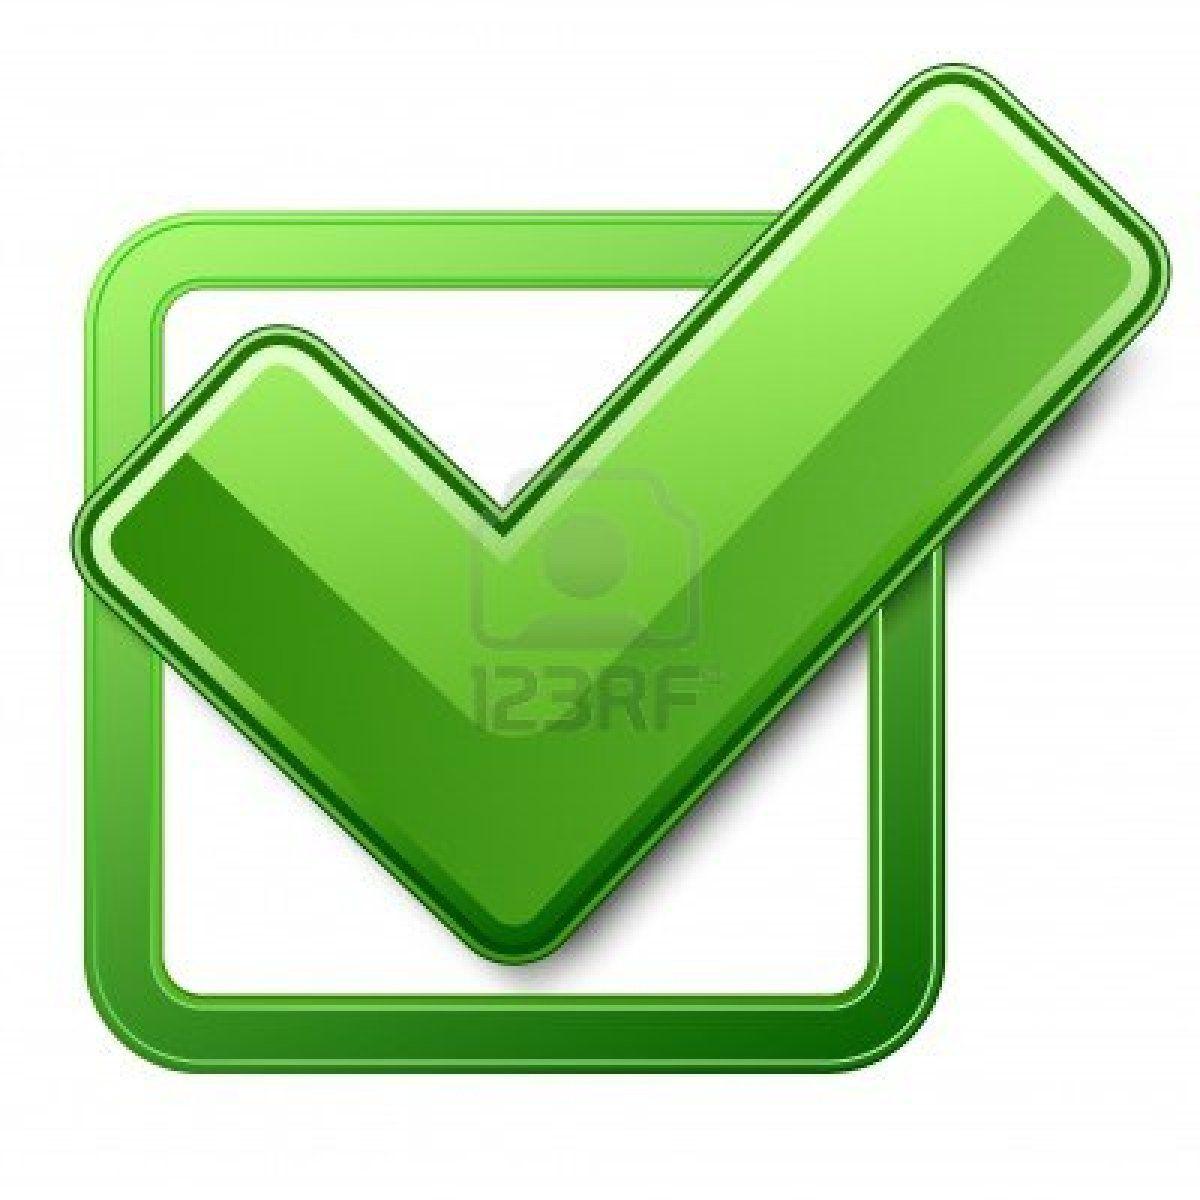 Check Sign Box With Check Mark Symbol For Facebook Facebook